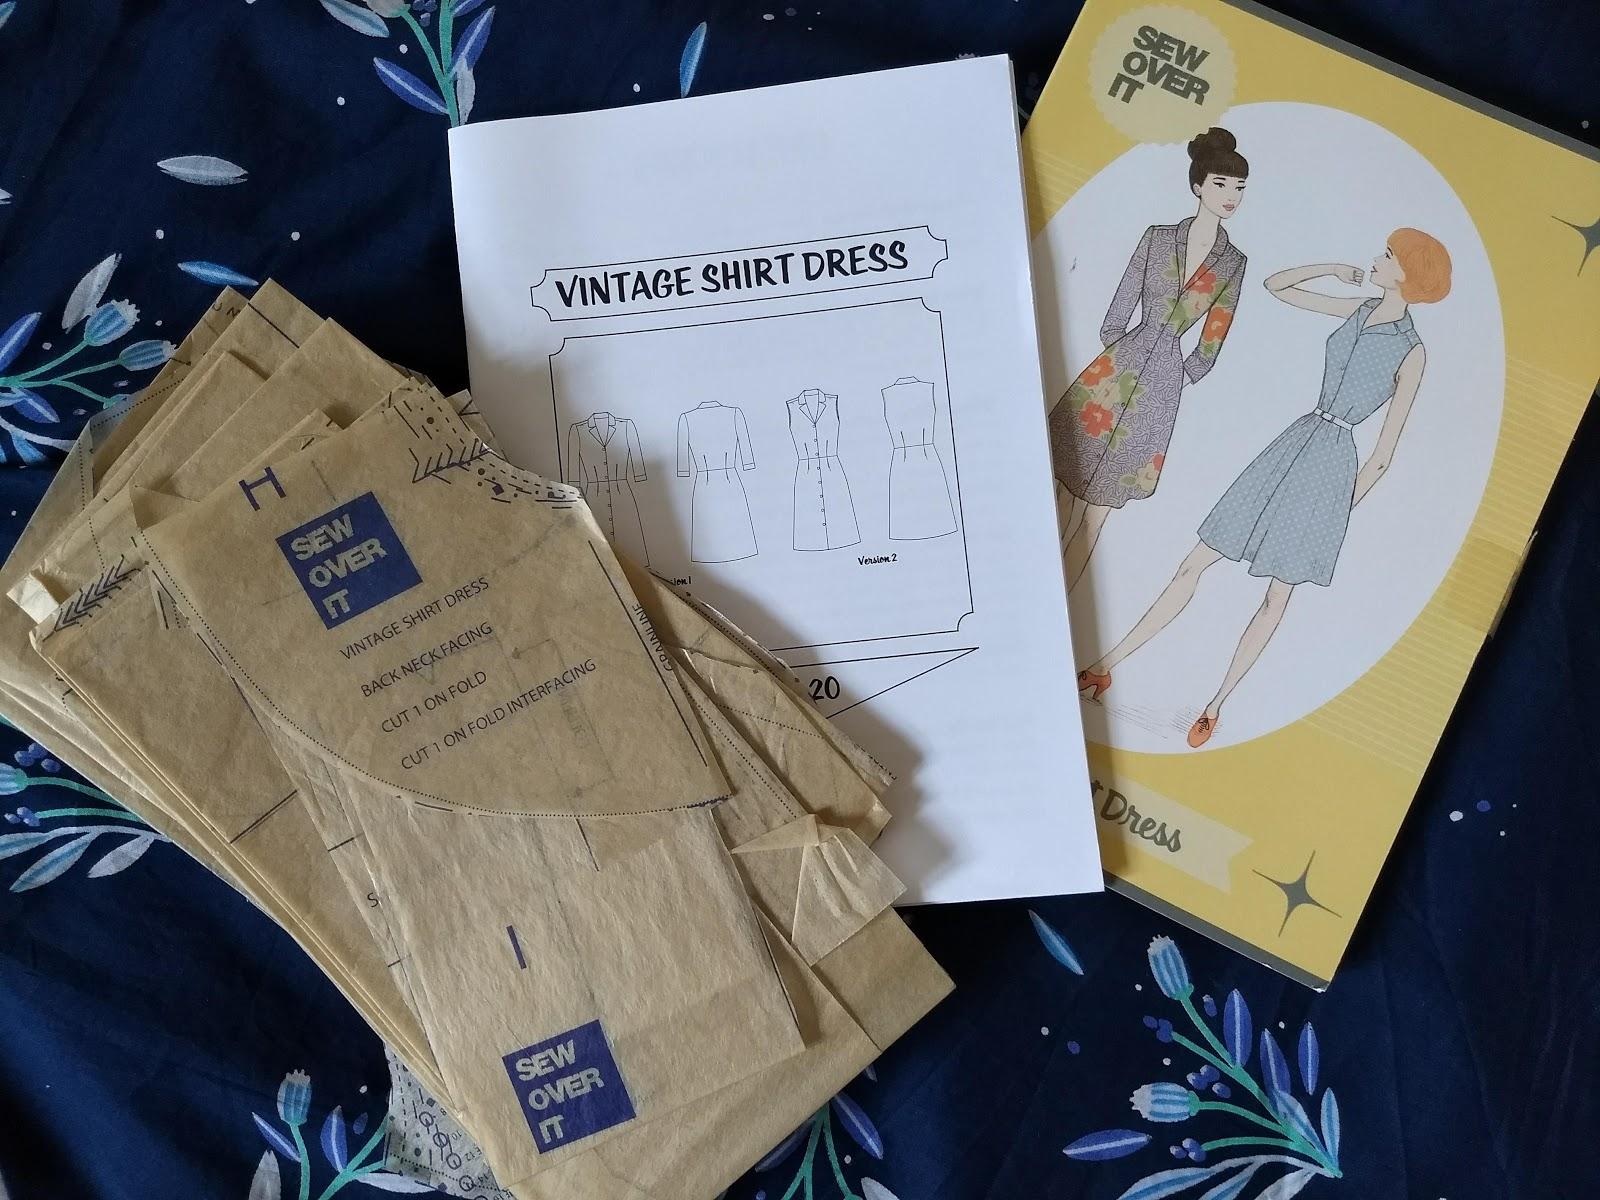 Sew Over It Vintage Shirt Dress and Lisa Comfort Fabric